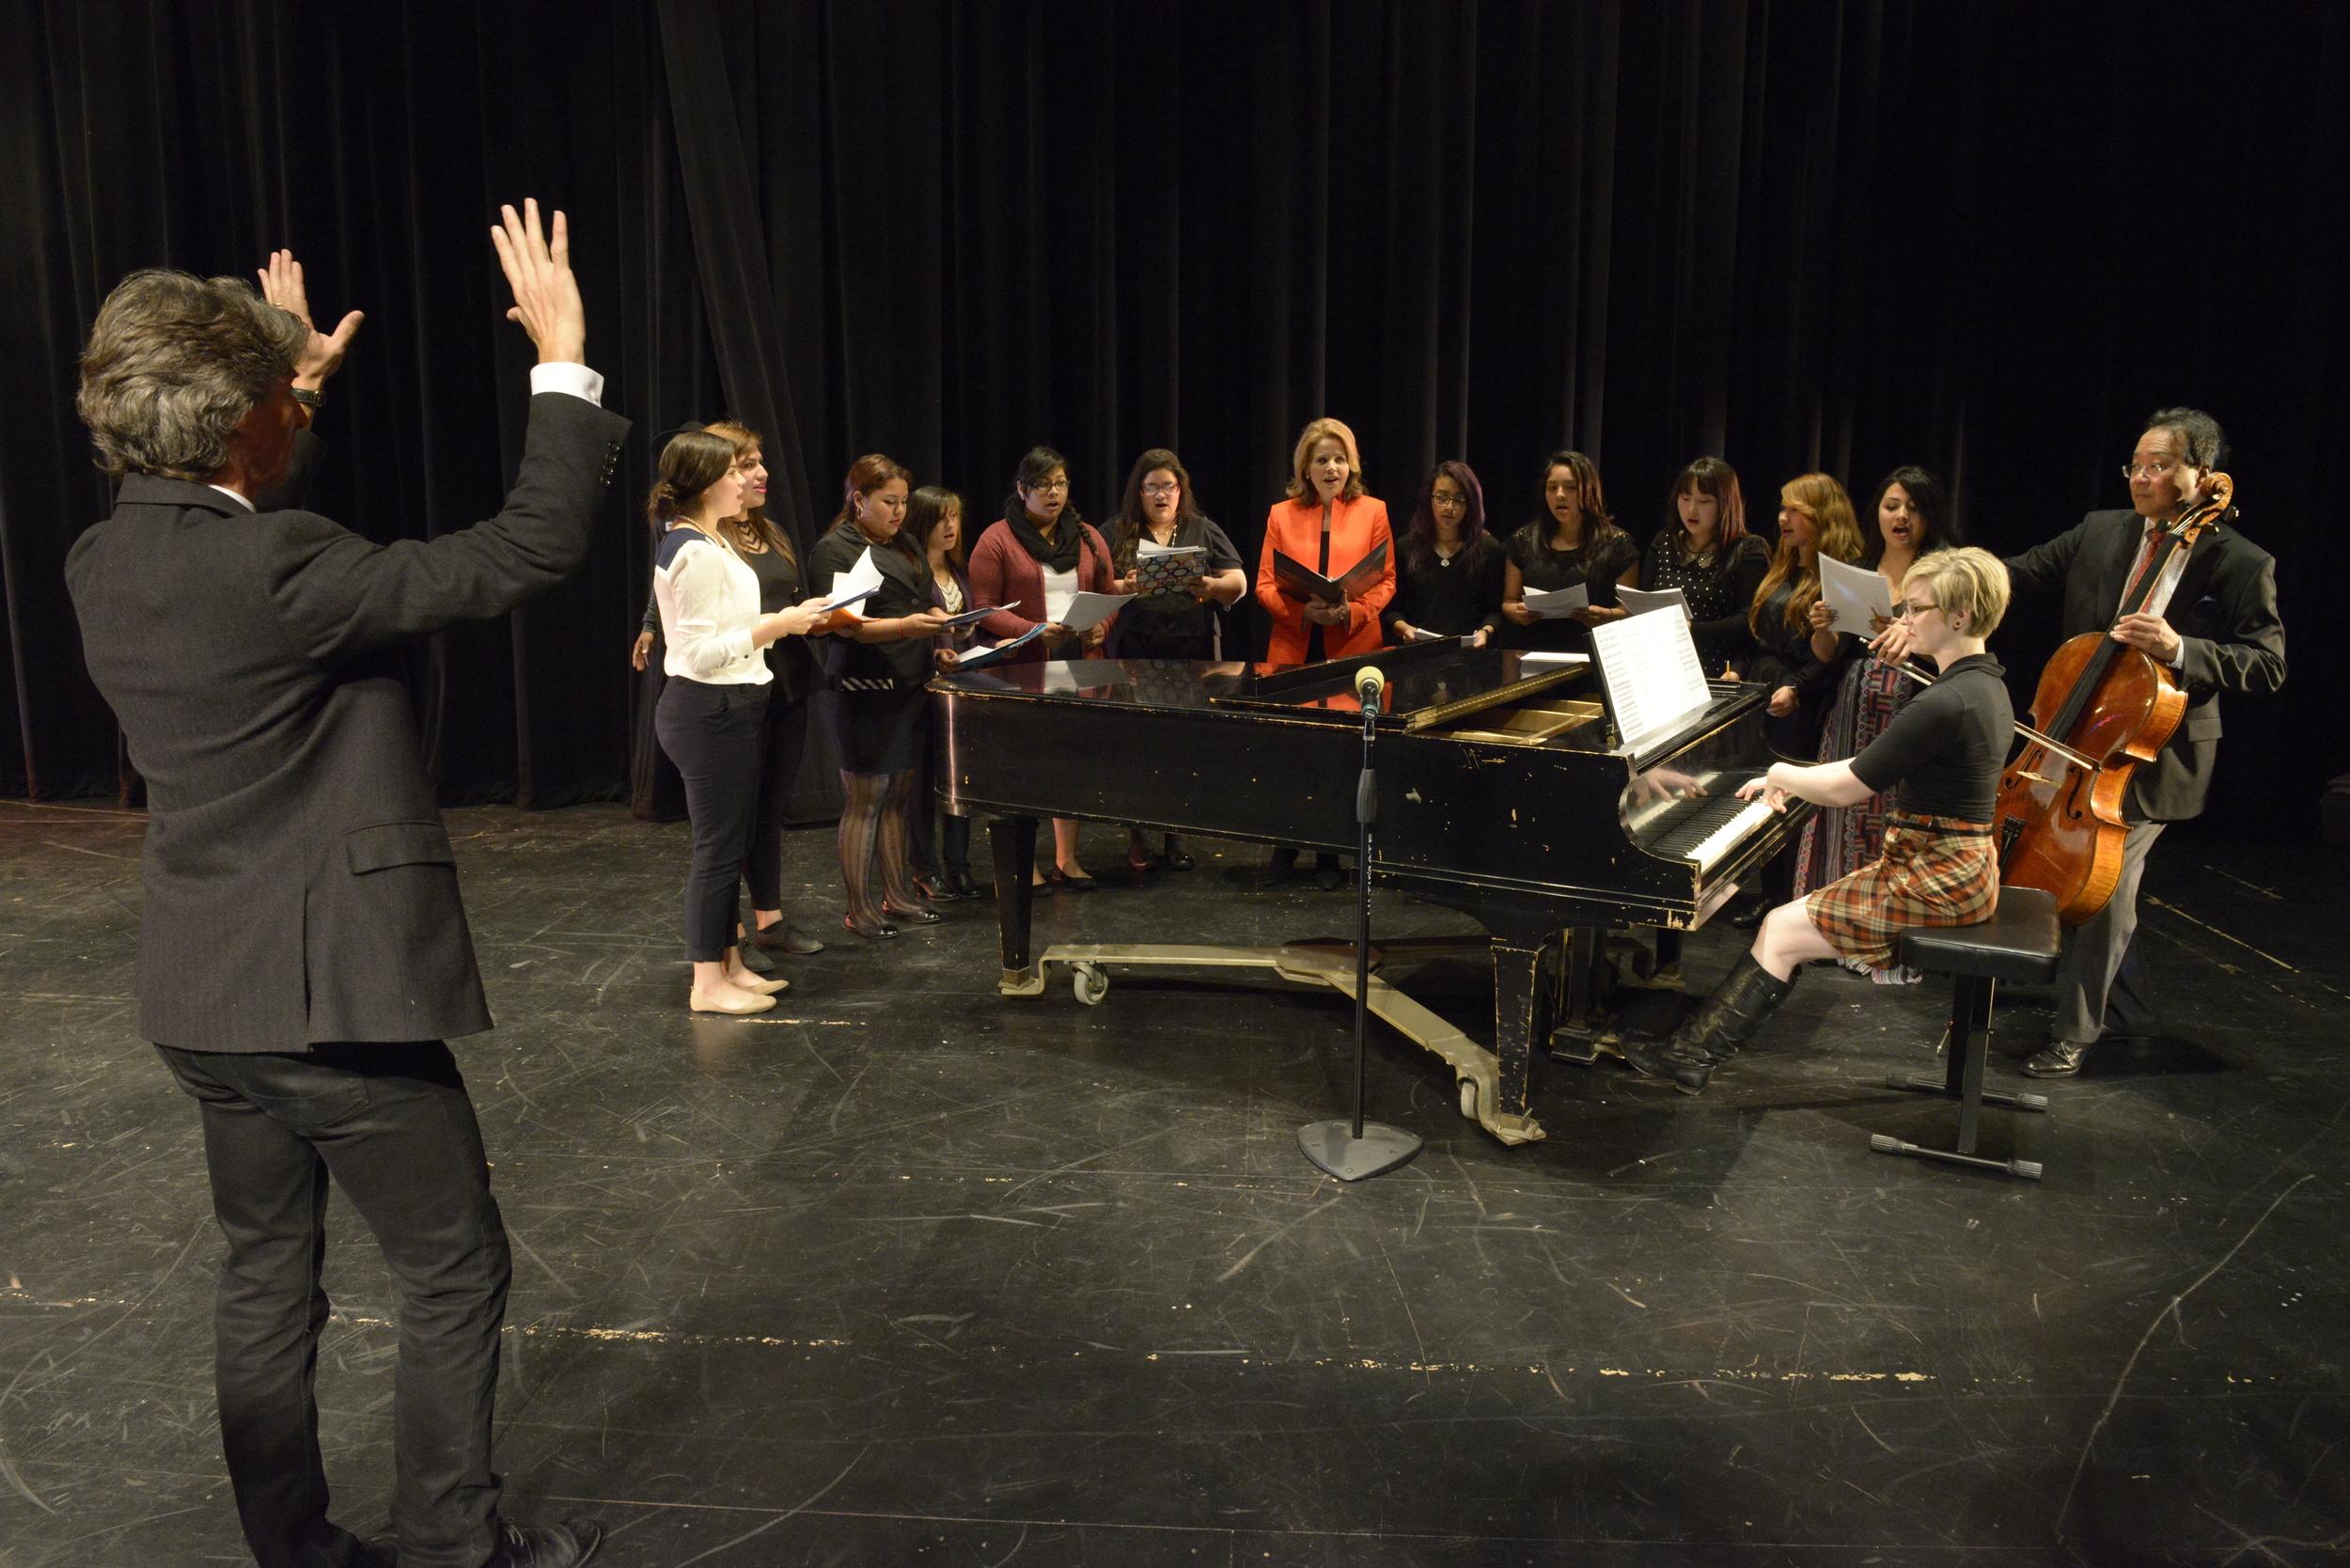 Damian Woetzel, Ren é e Fleming and Yo-Yo Ma work with music students of Benito Juarez Community Academy